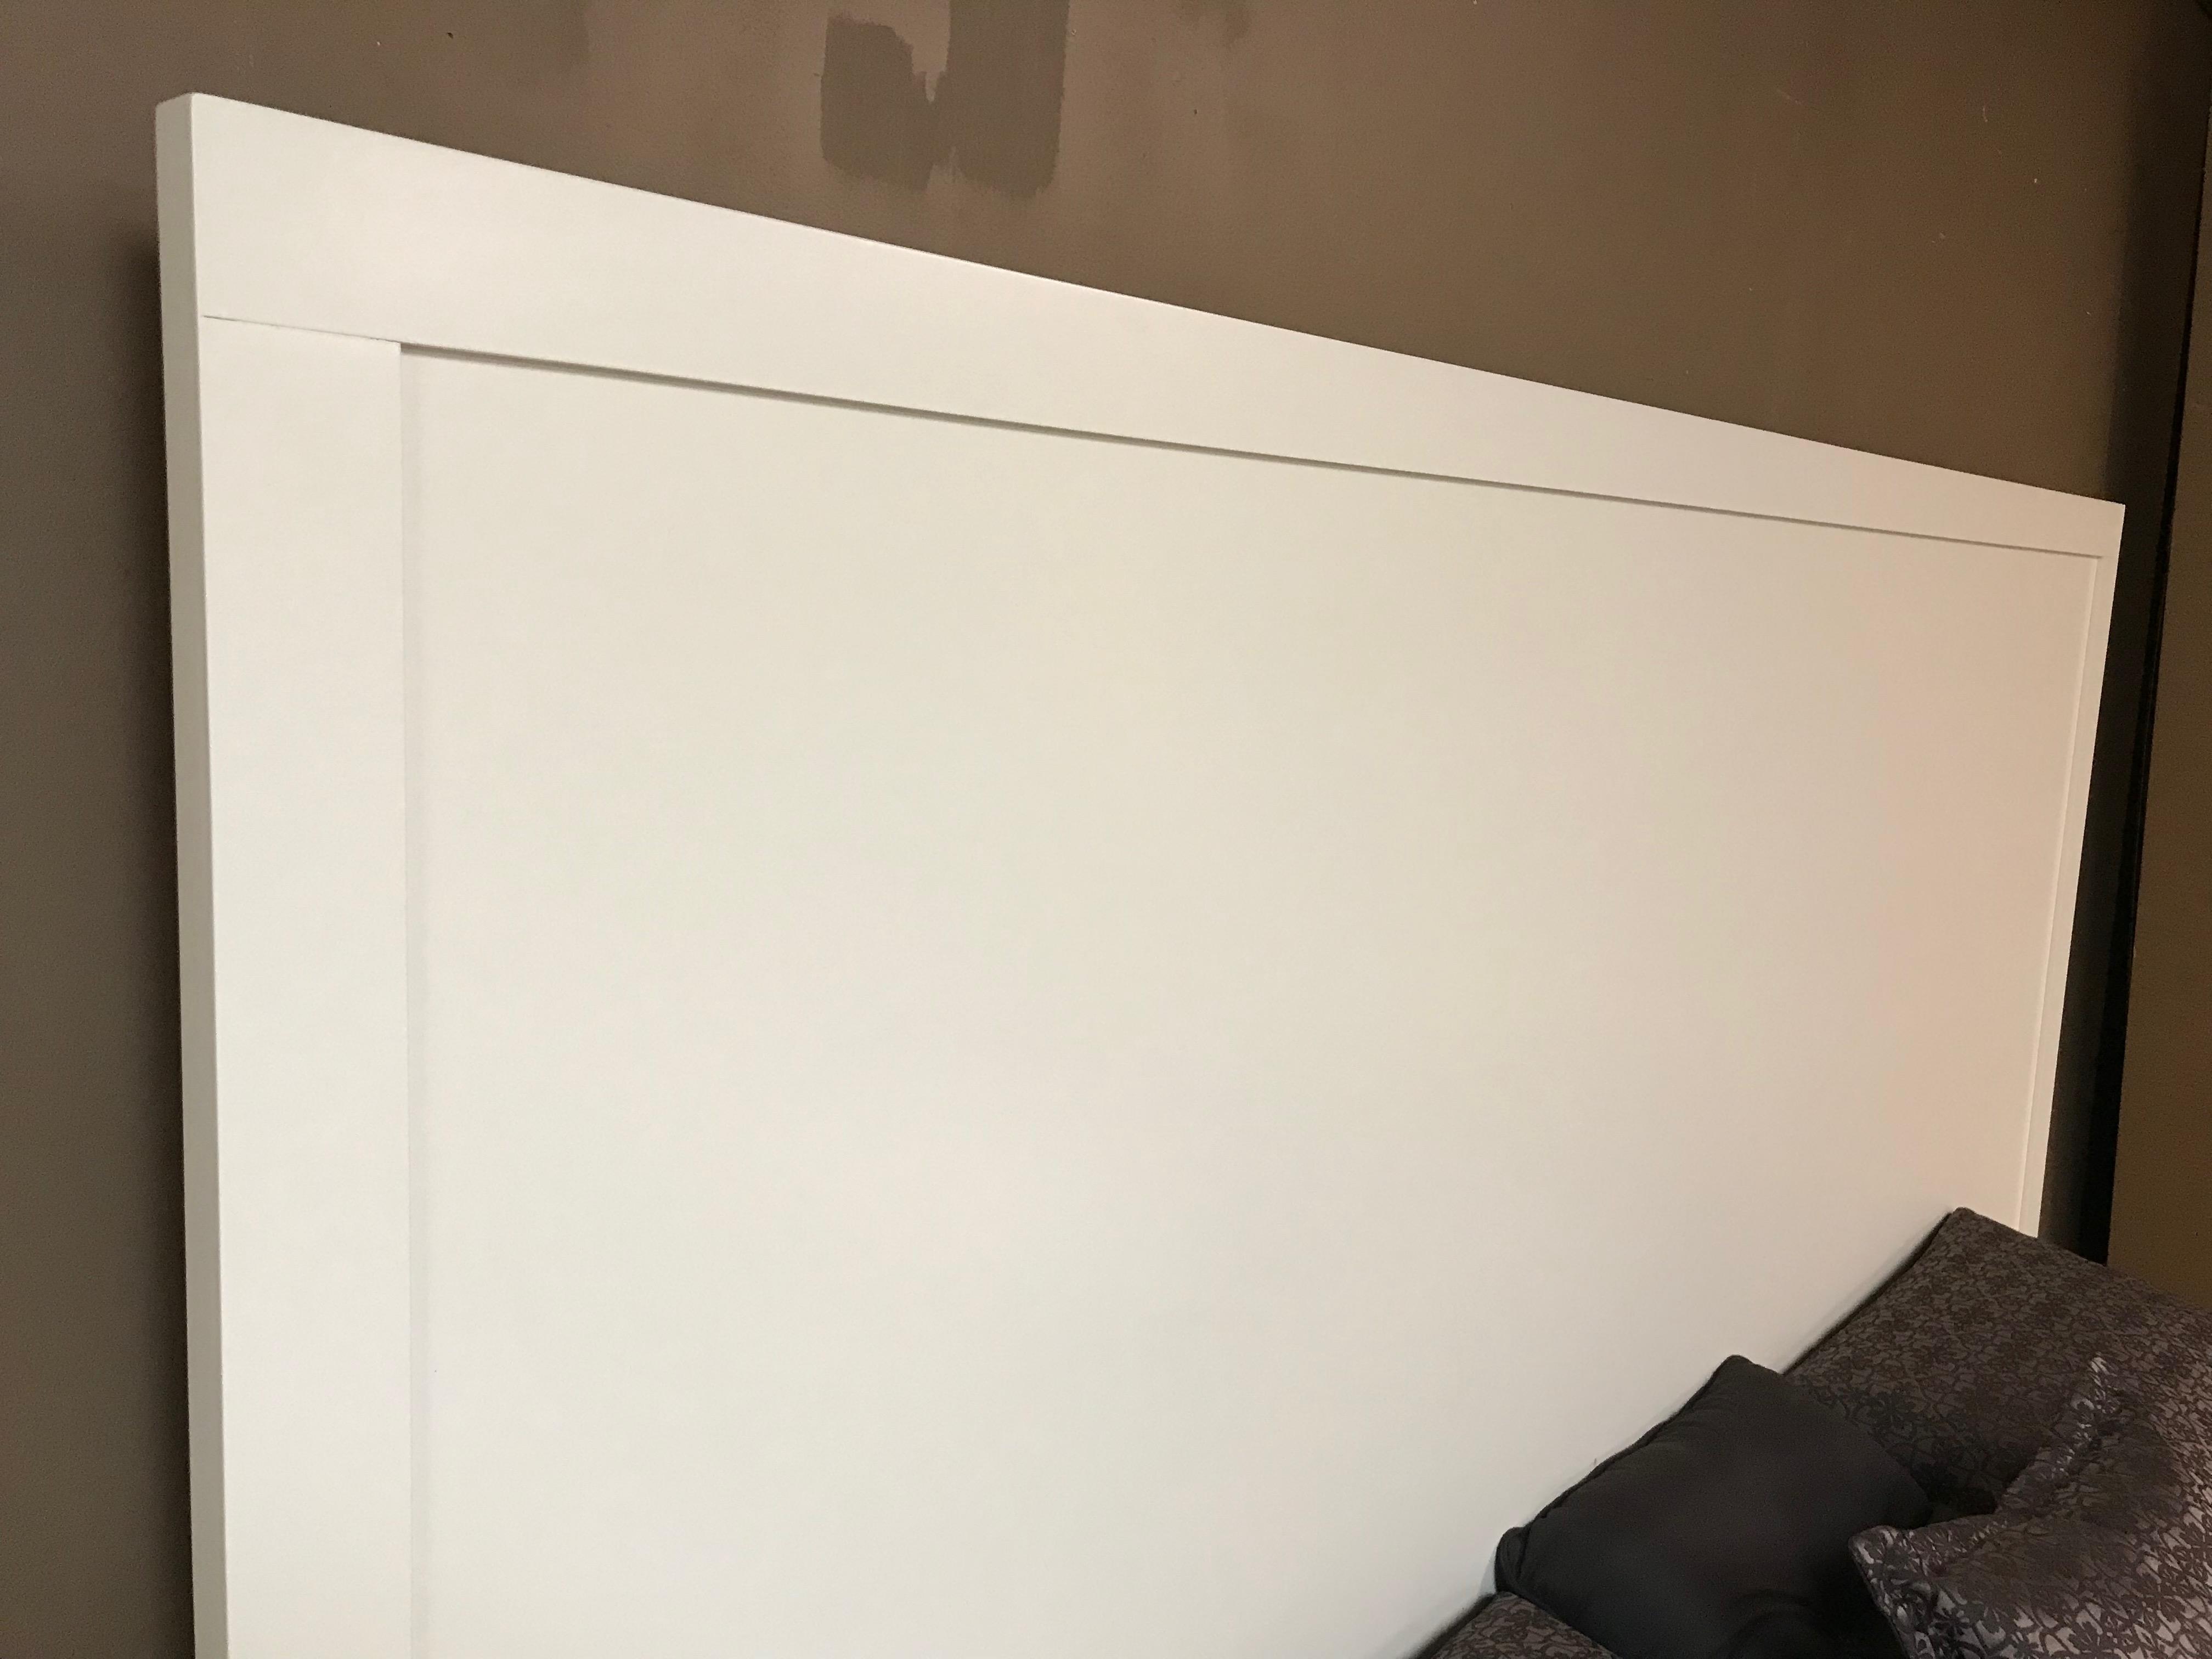 King Lift Bed Headboard